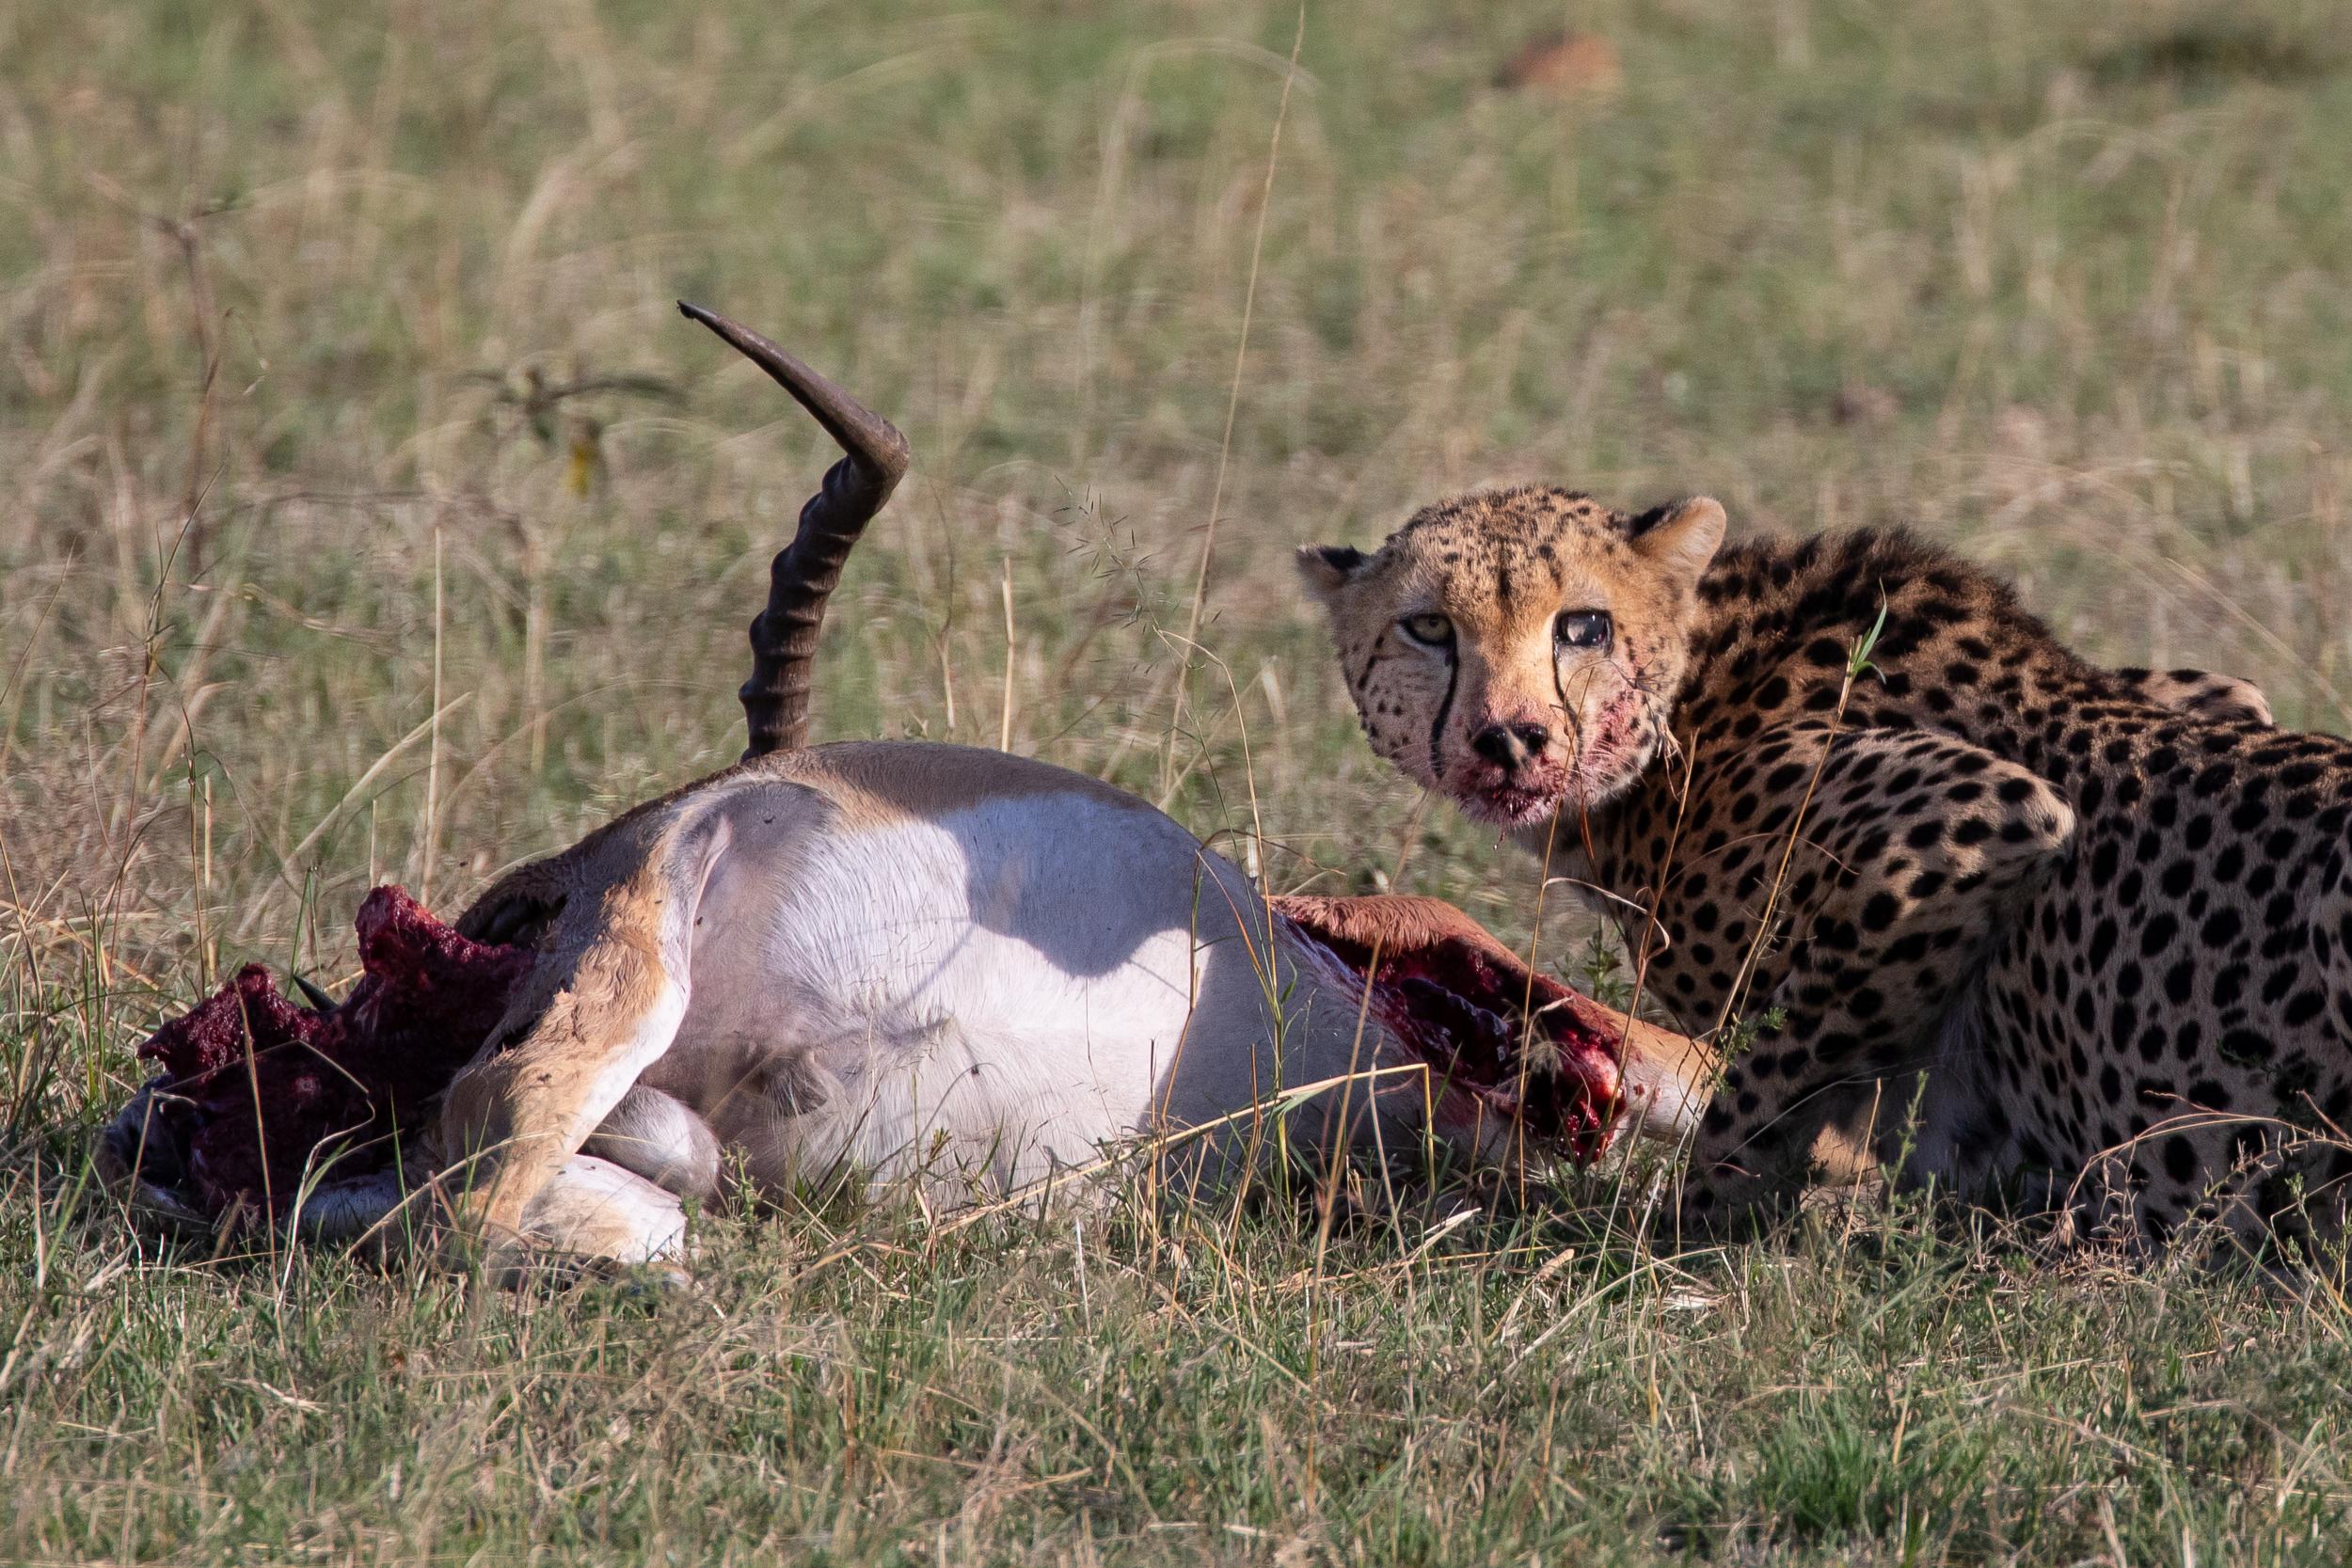 A cheetah eats an impala in Maasai Mara National Park. September 2018 - Maasai Mara, Kenya.